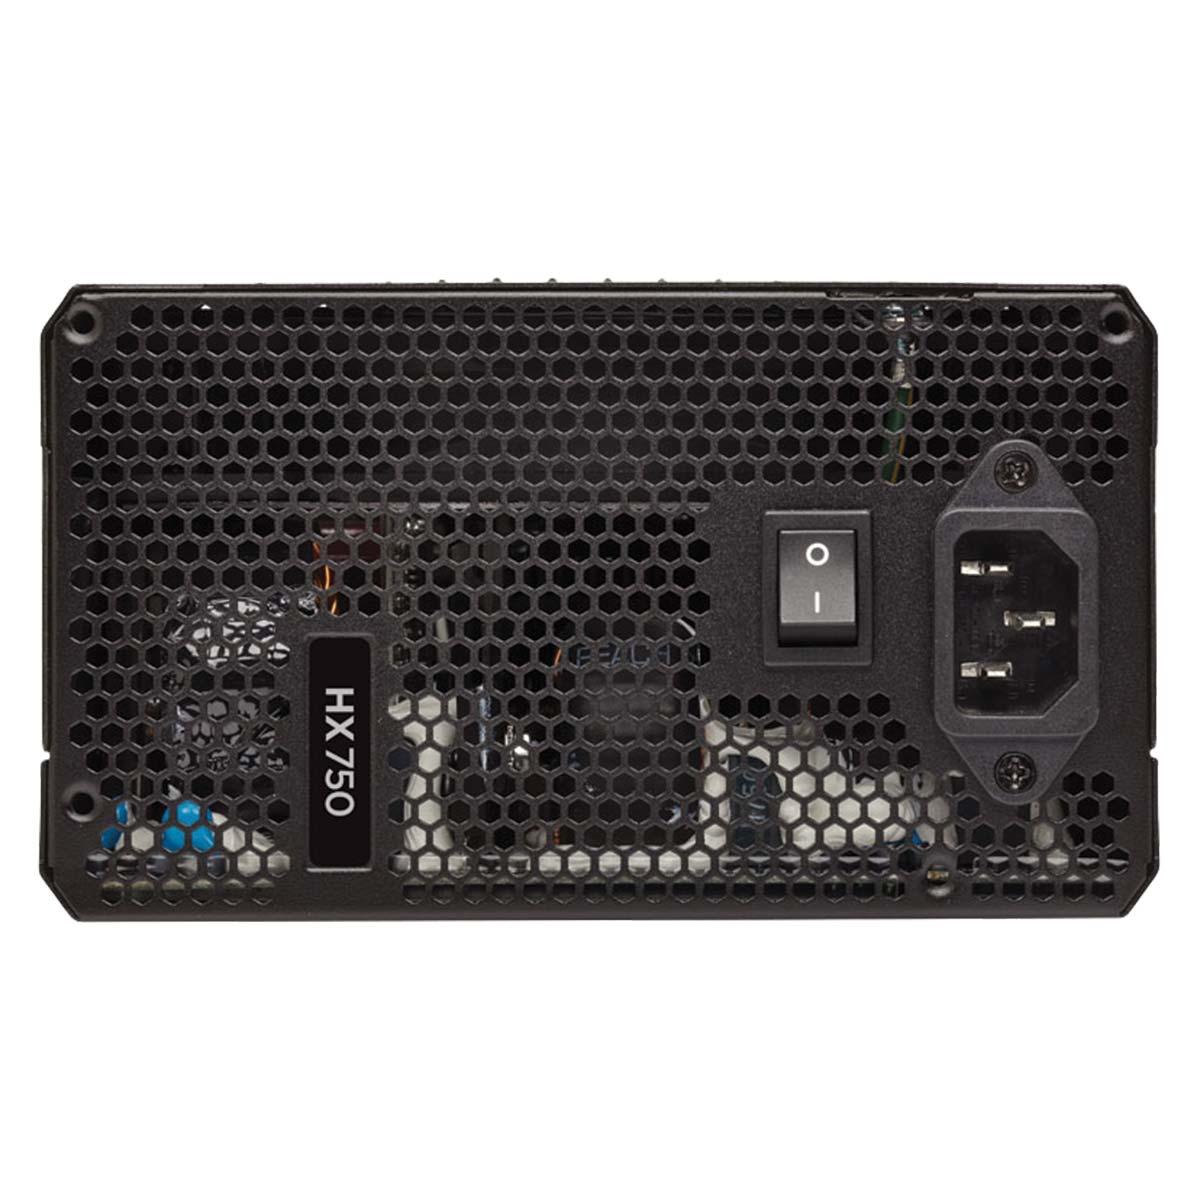 Fonte ATX 750W HX750 80PLUS Platinum - CP-9020137-WW - Corsair